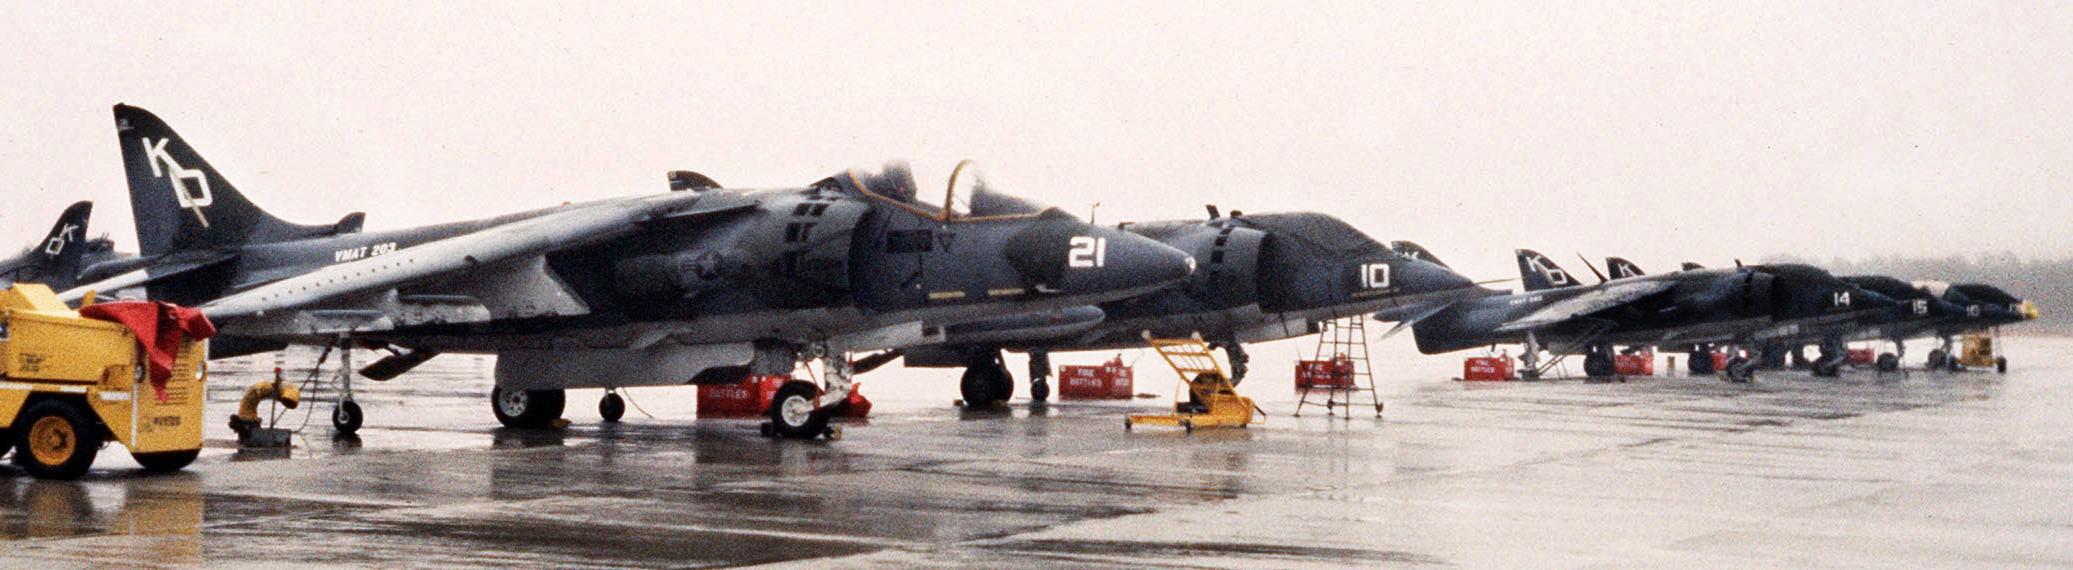 VMAT-203 Hawks Marine Attack Training Squadron USMC